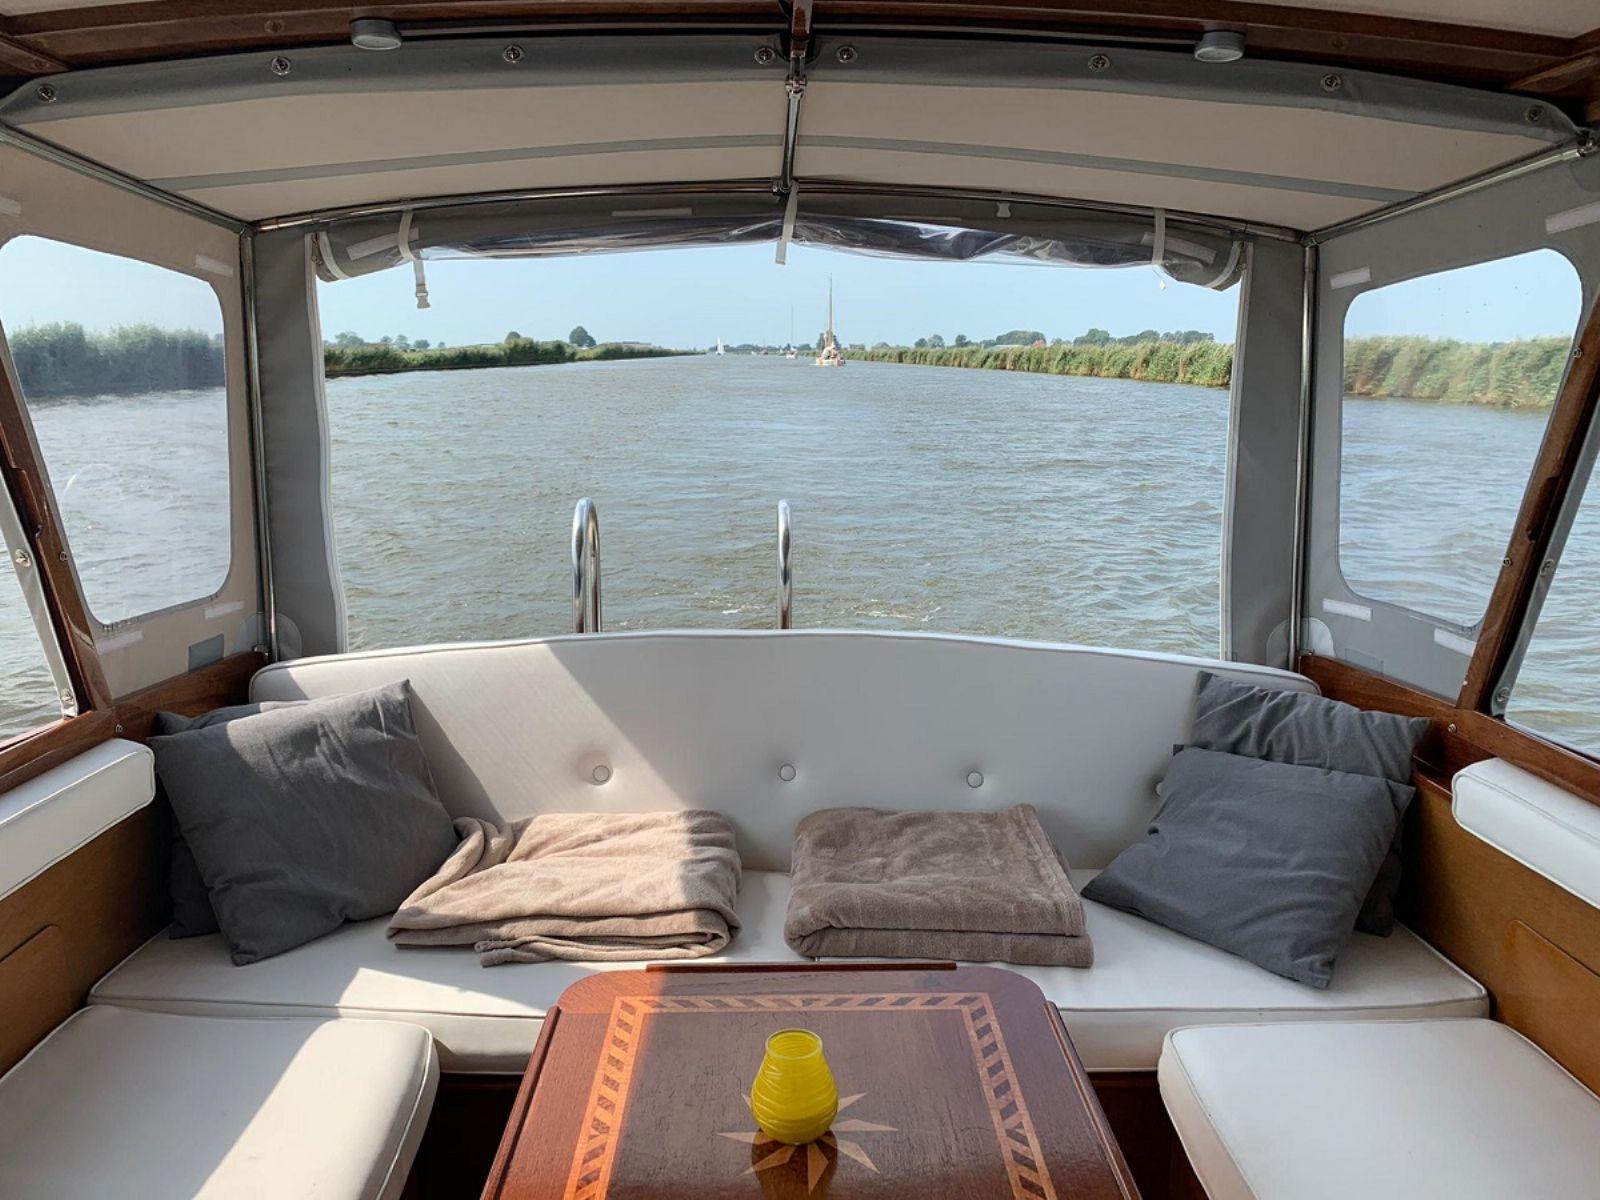 yachtcharter in het charmante vissersdorp Lemmer